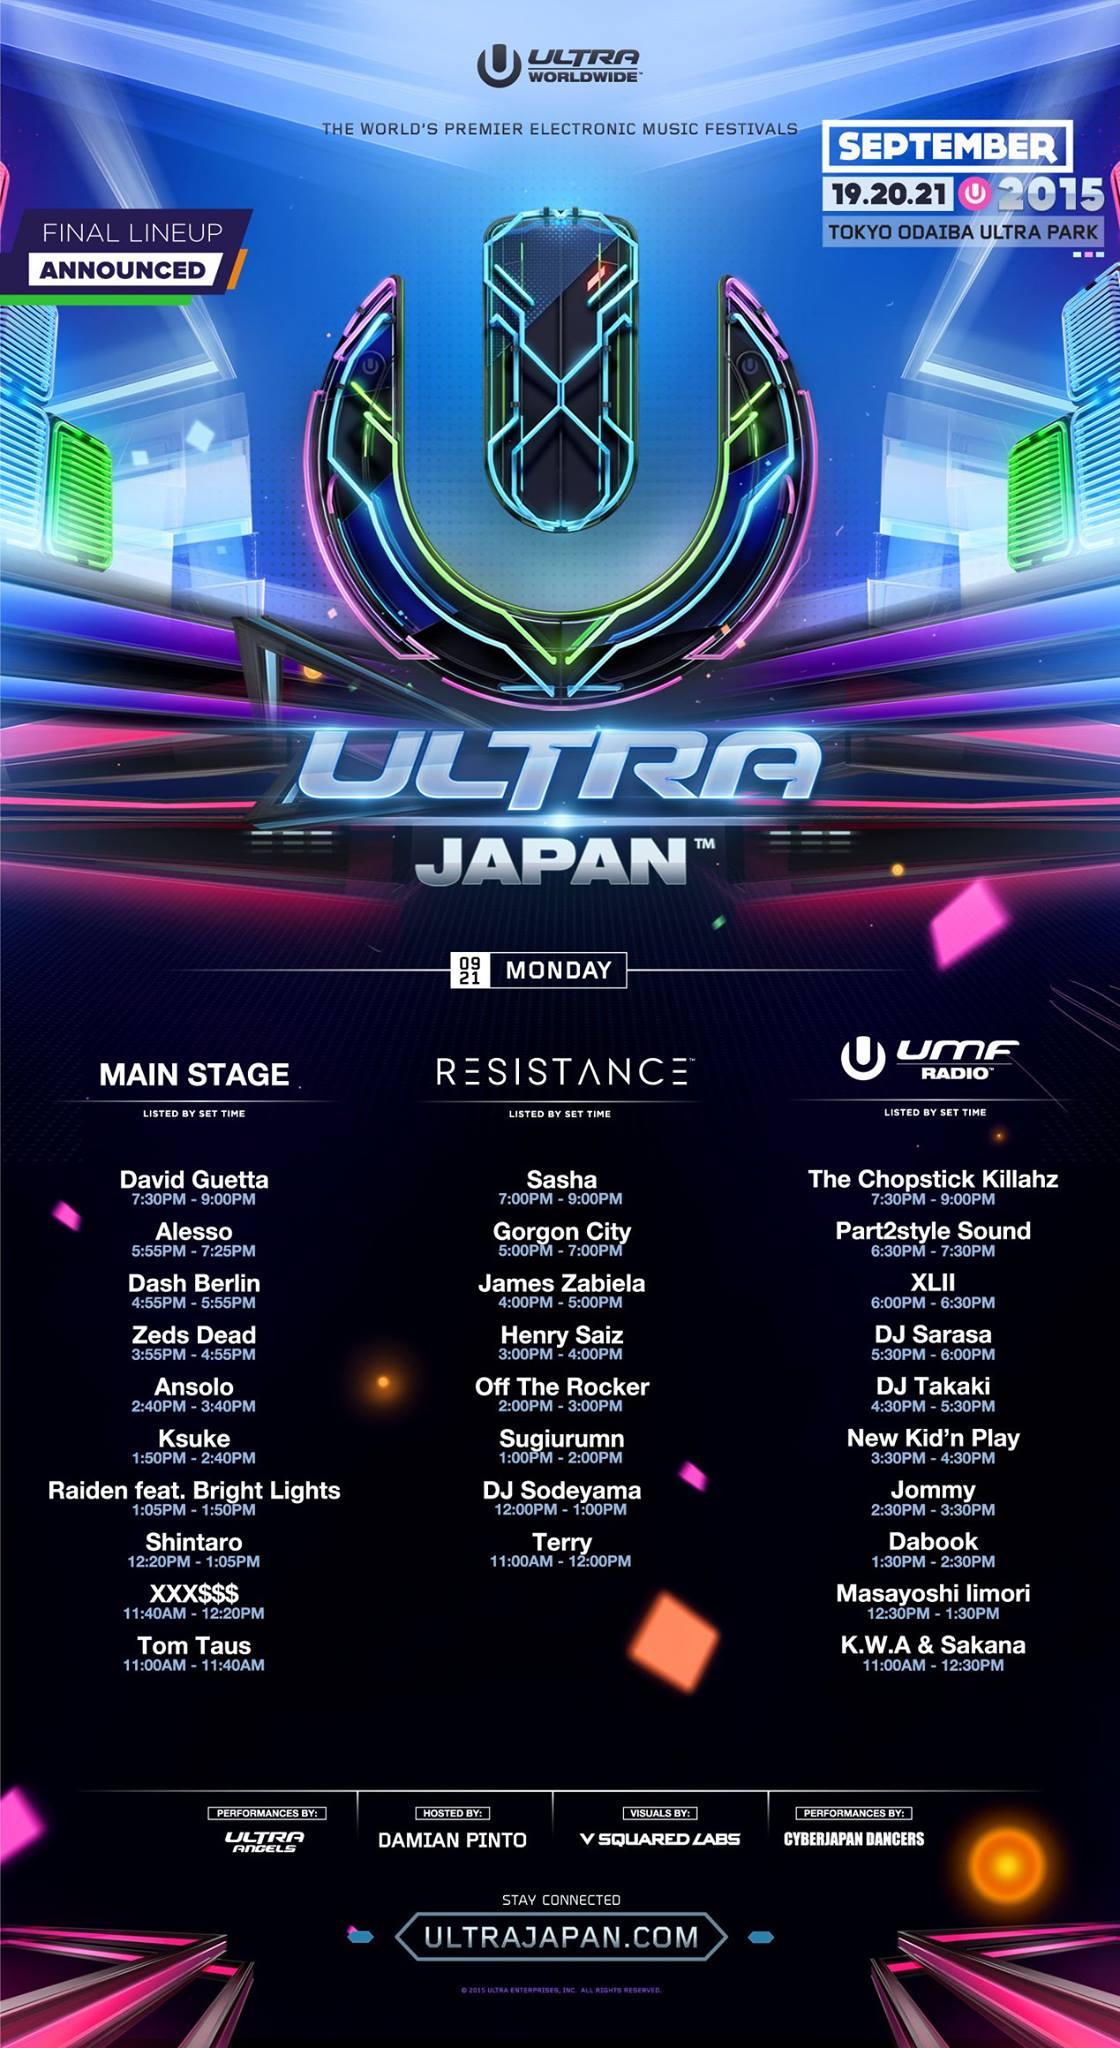 ULTRA JAPAN 2015 DAY 3